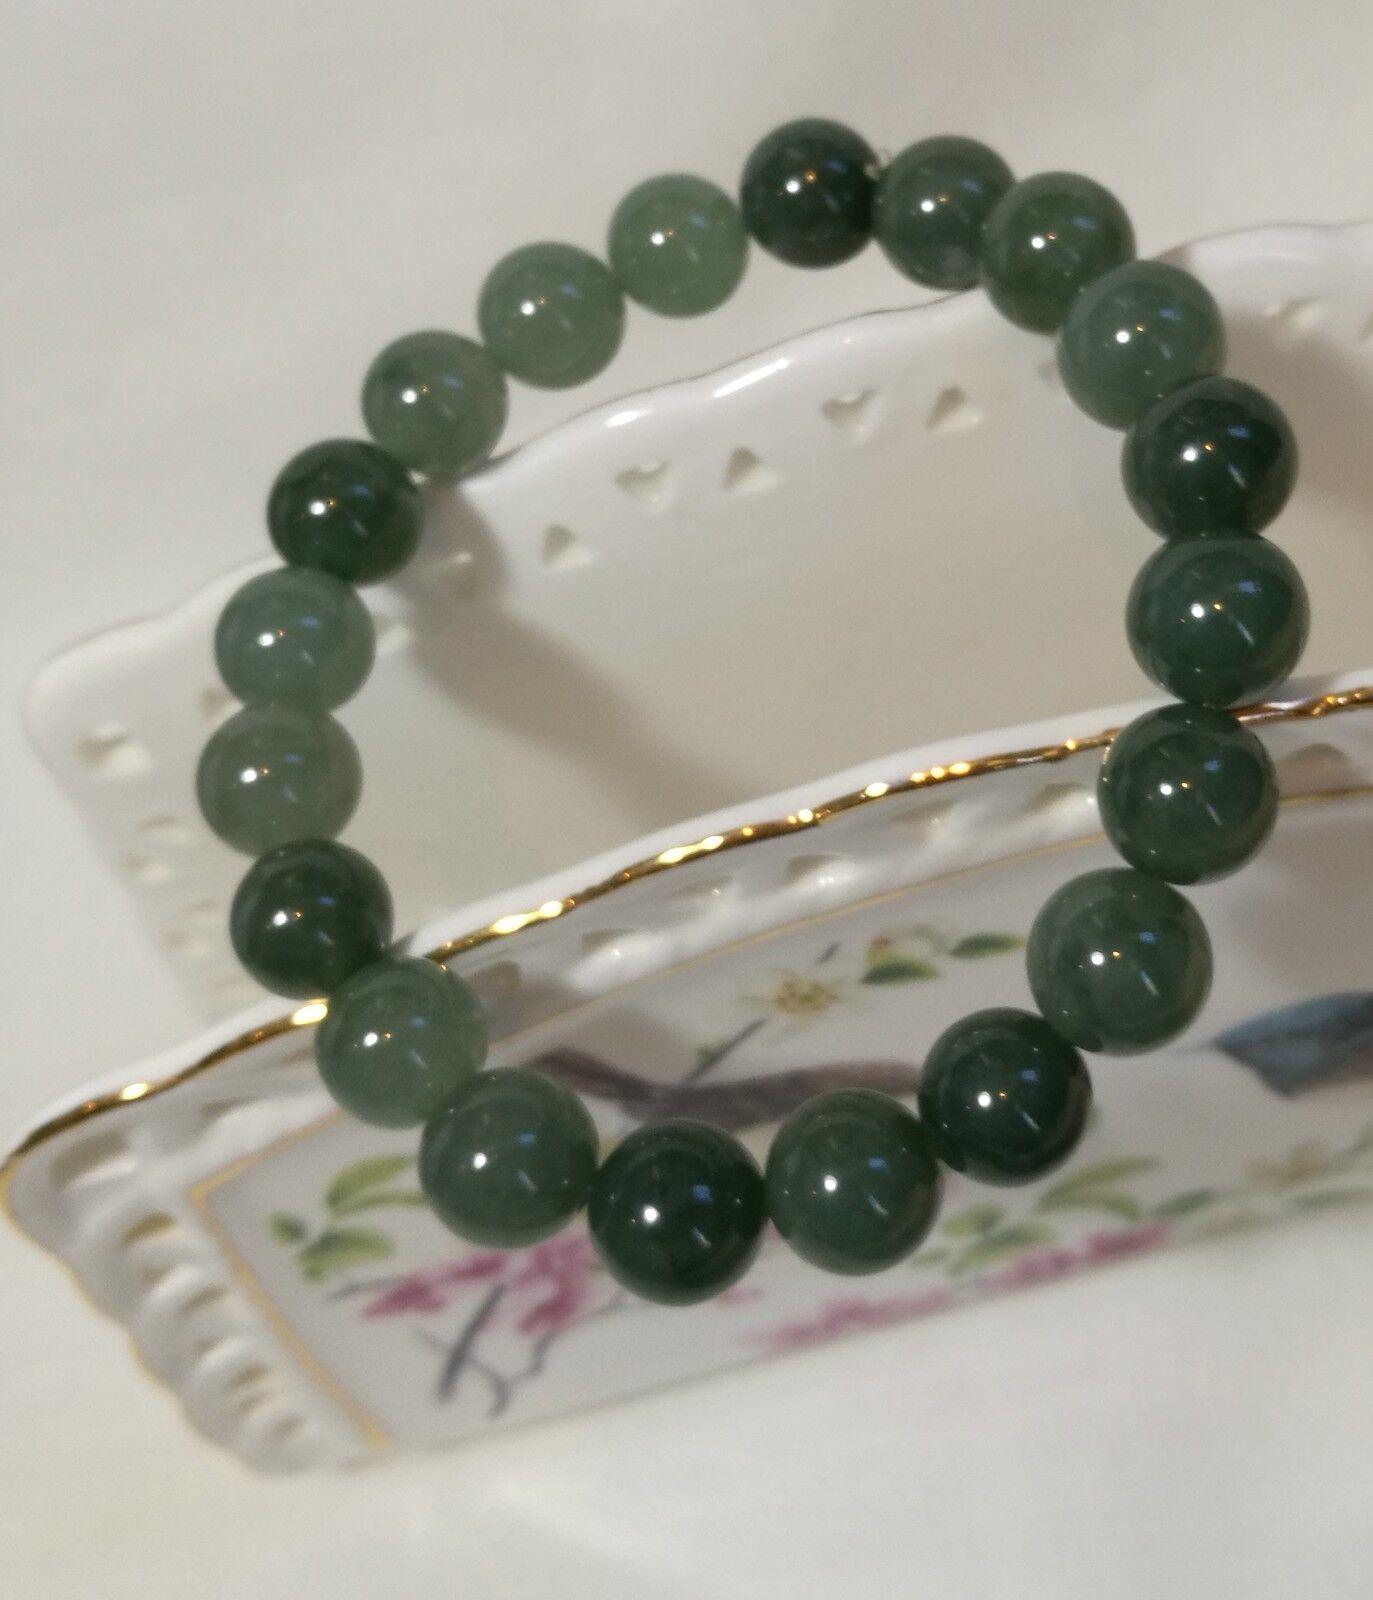 Certified A grade oil green 10mm jadeite jade bracelet adjustable length 20pcs